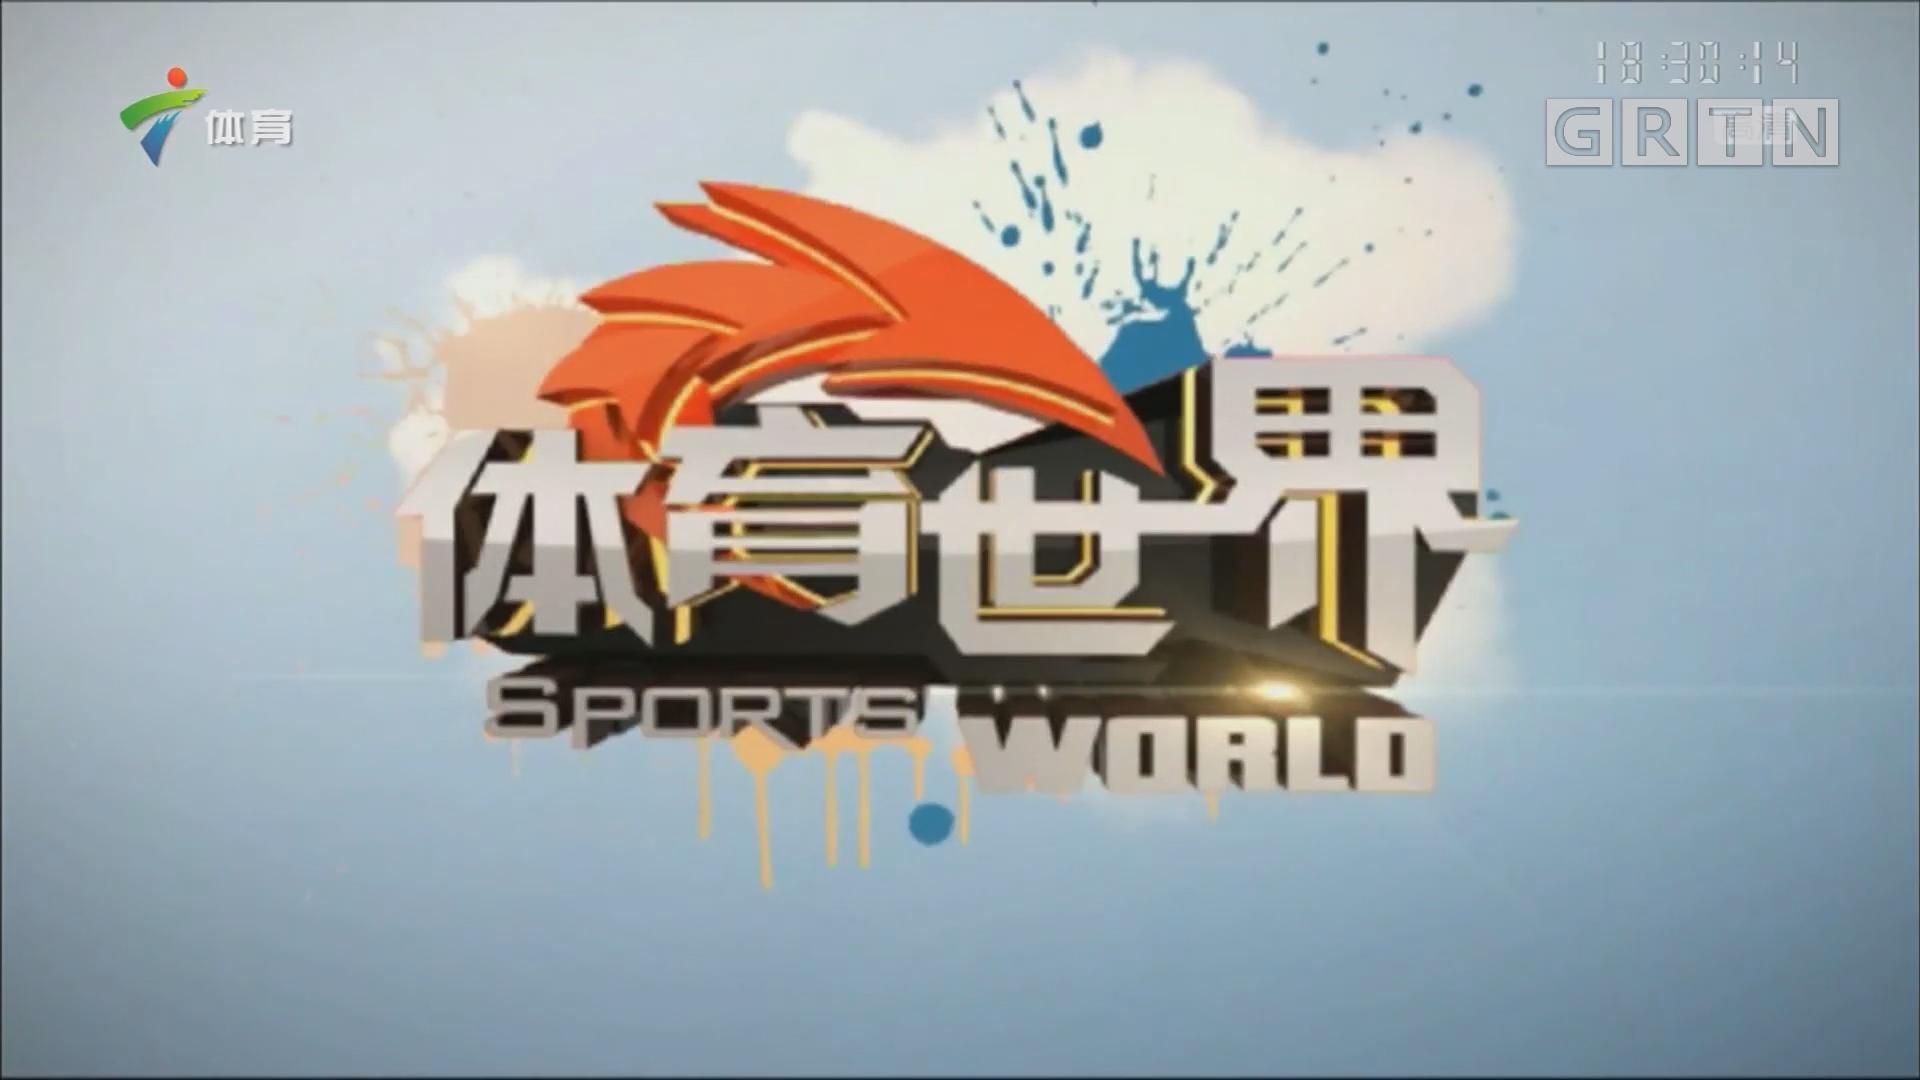 [HD][2017-12-29]体育世界:平昌冬奥会火炬传递仪式继续进行